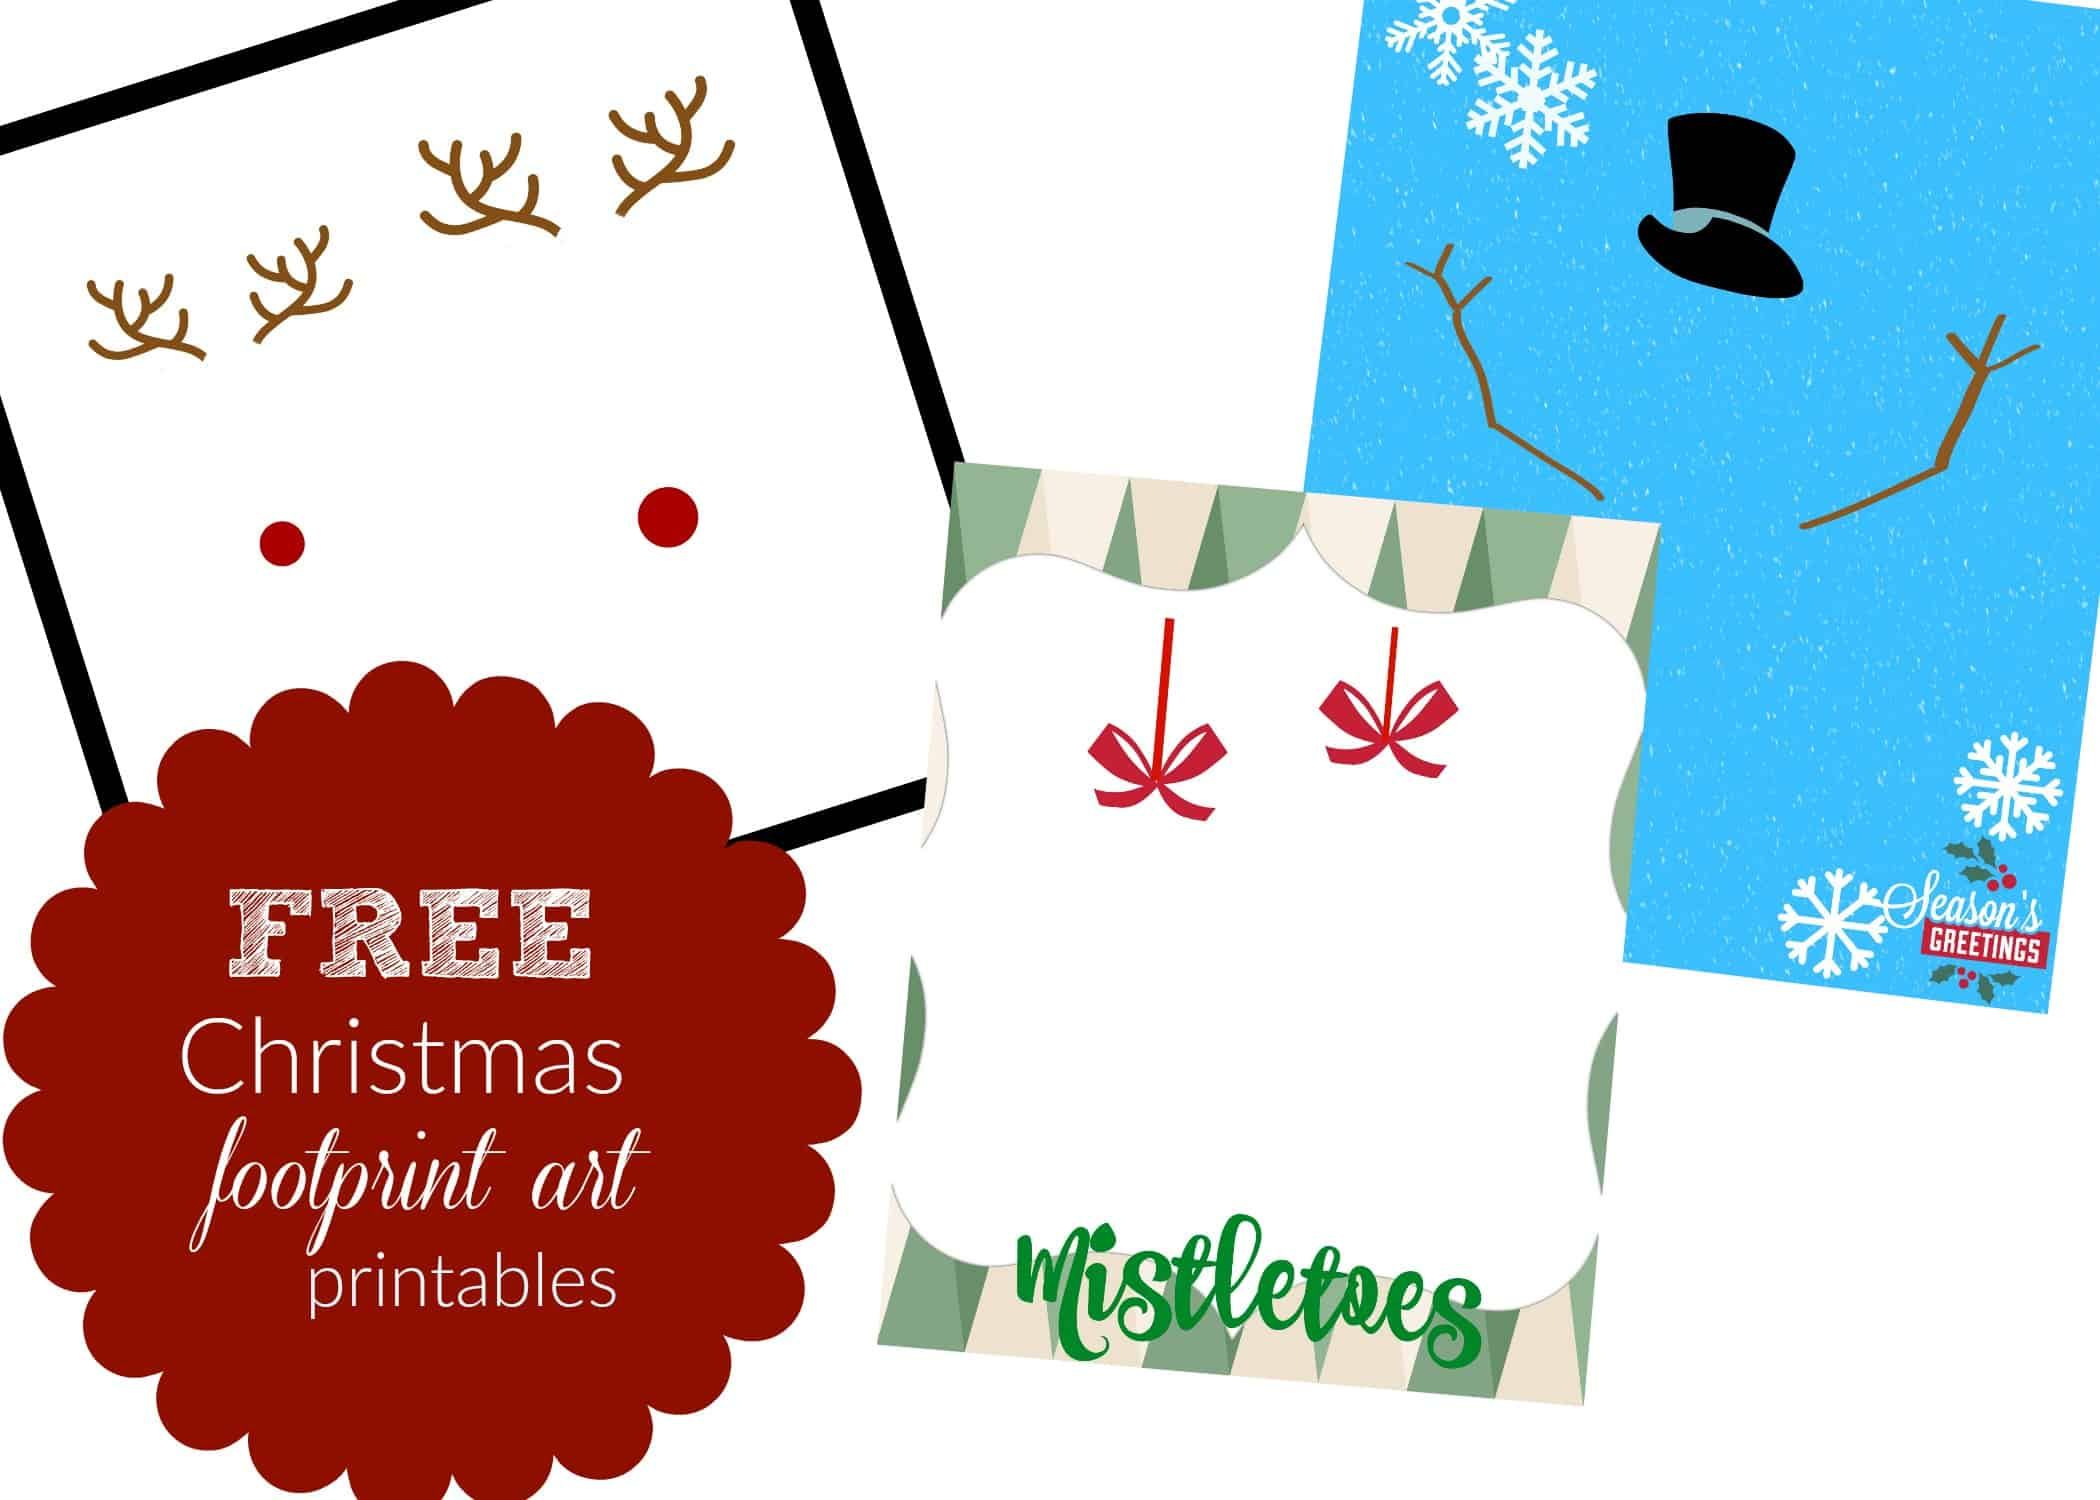 3 Christmas Footprint Art Templates: Free Printables